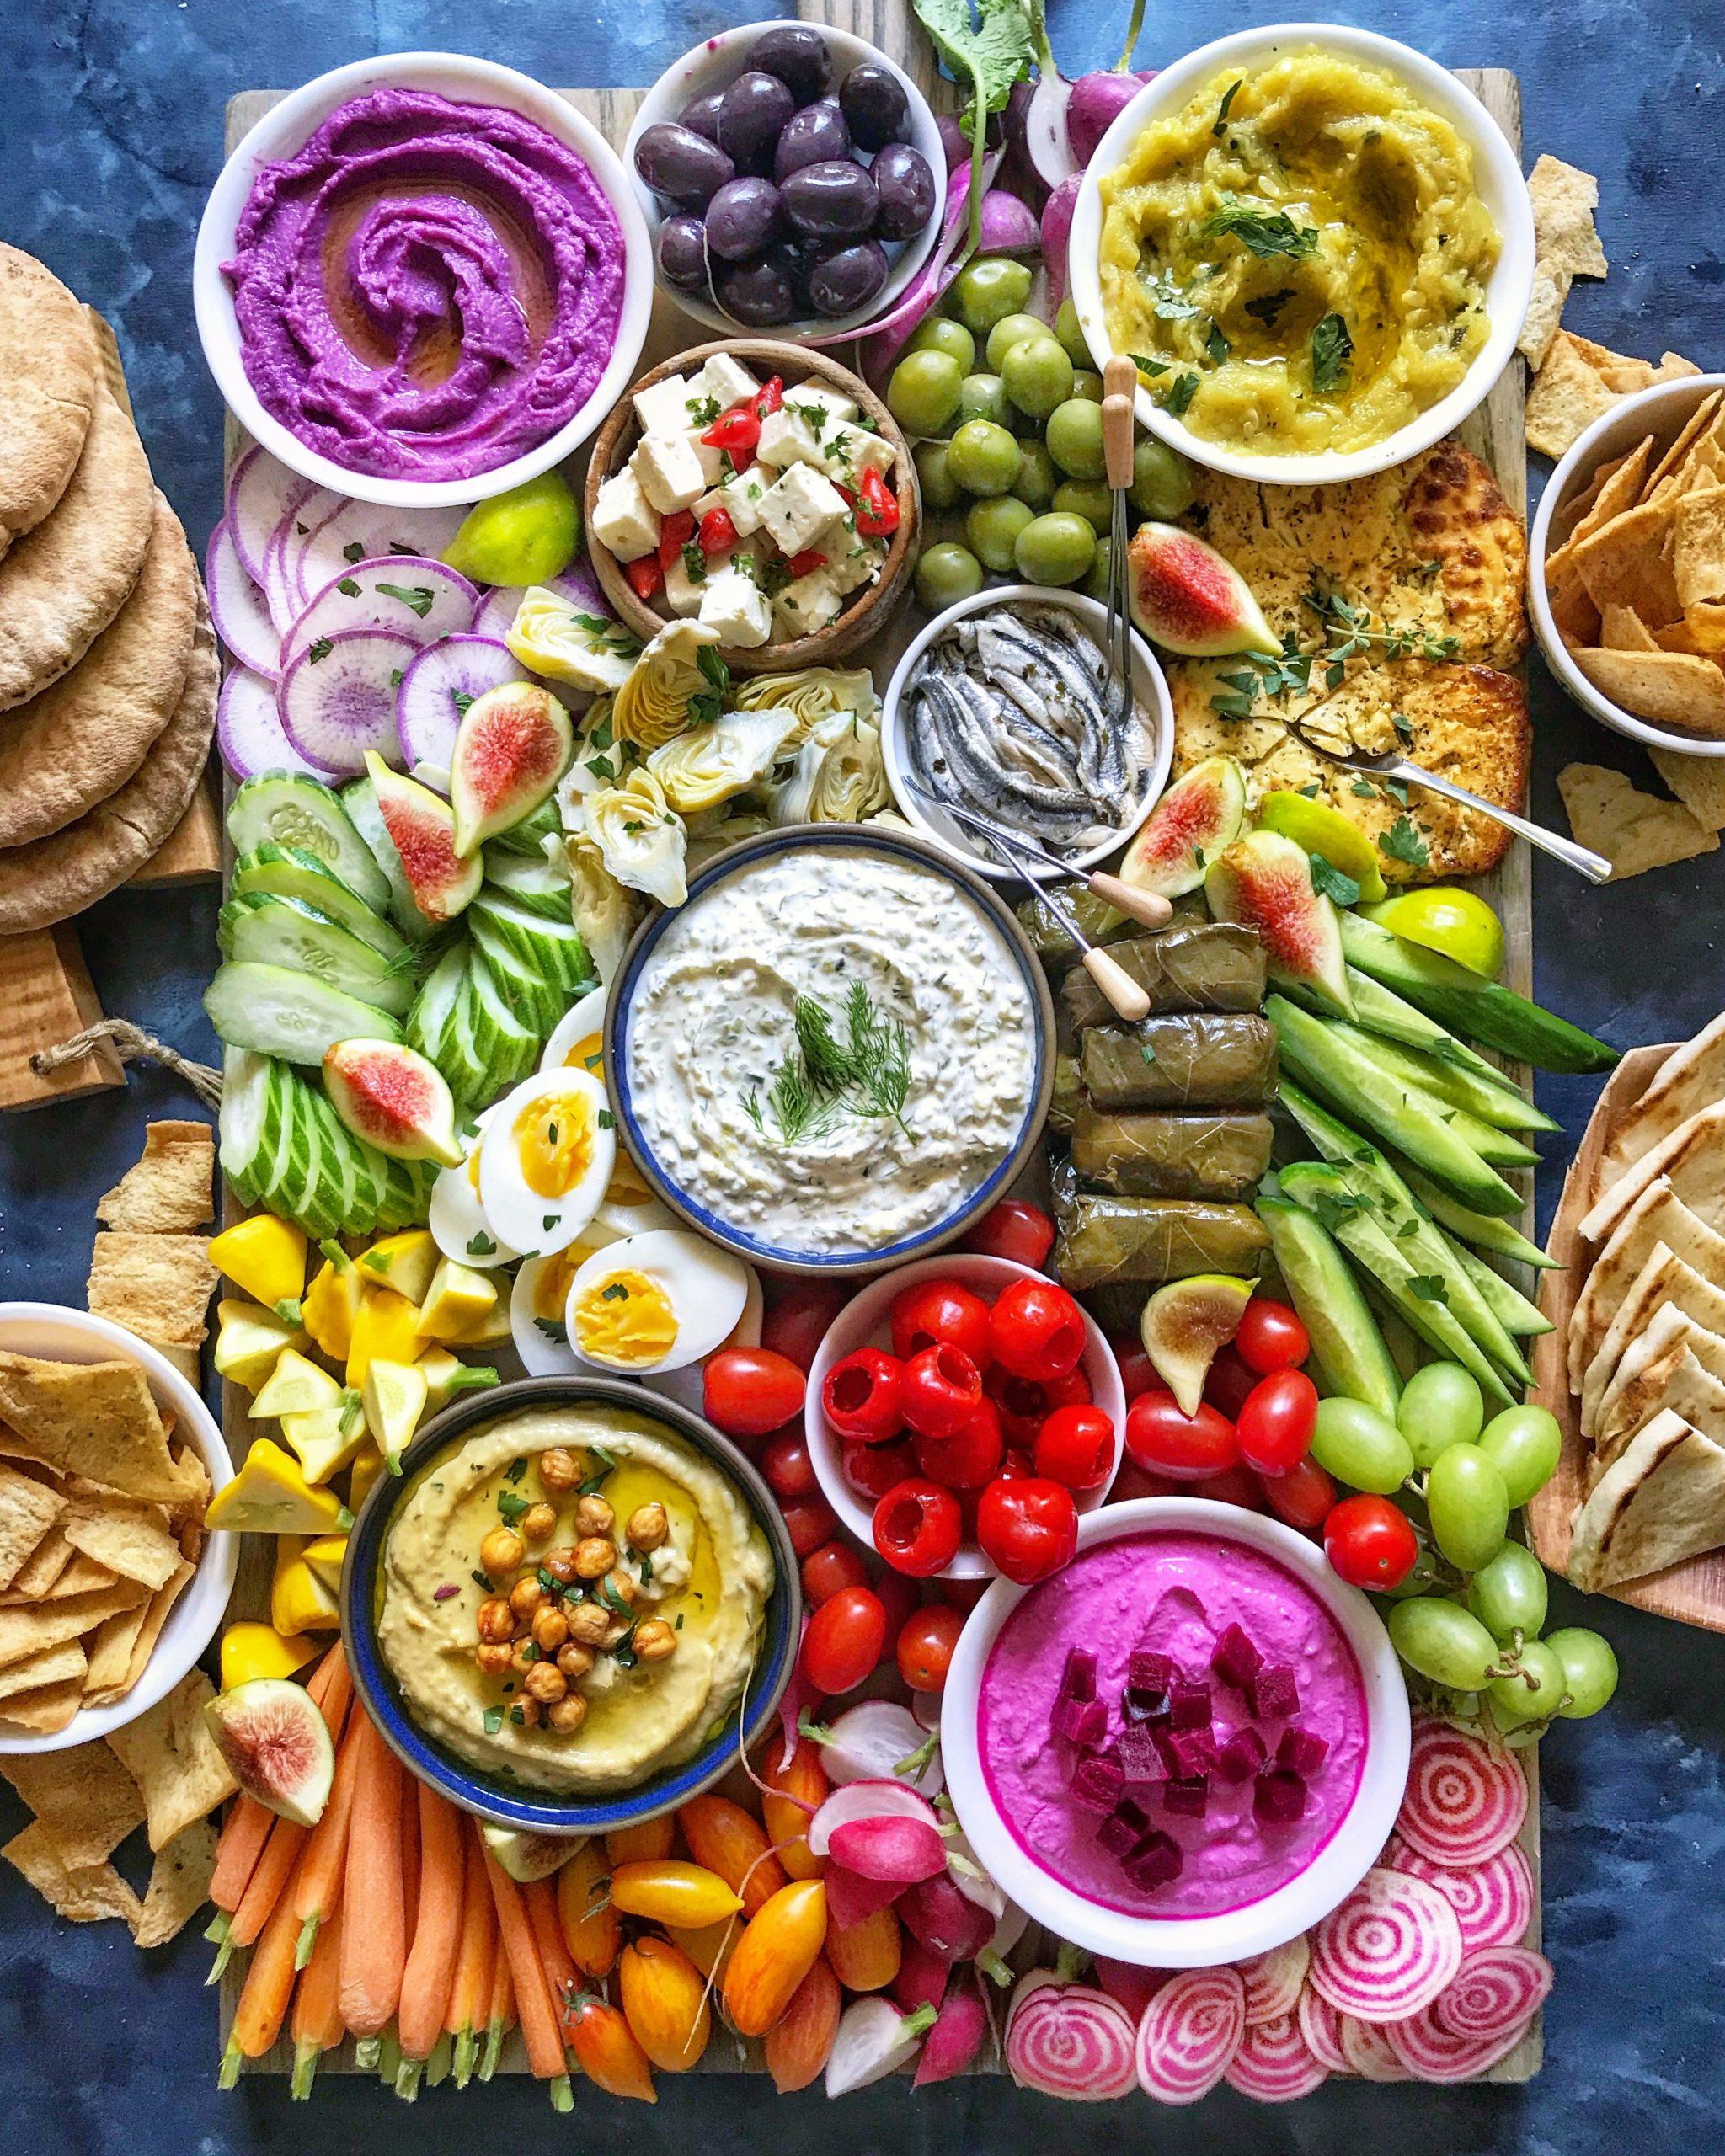 mediterranean mezze board with hummus, tzatziki and other dips